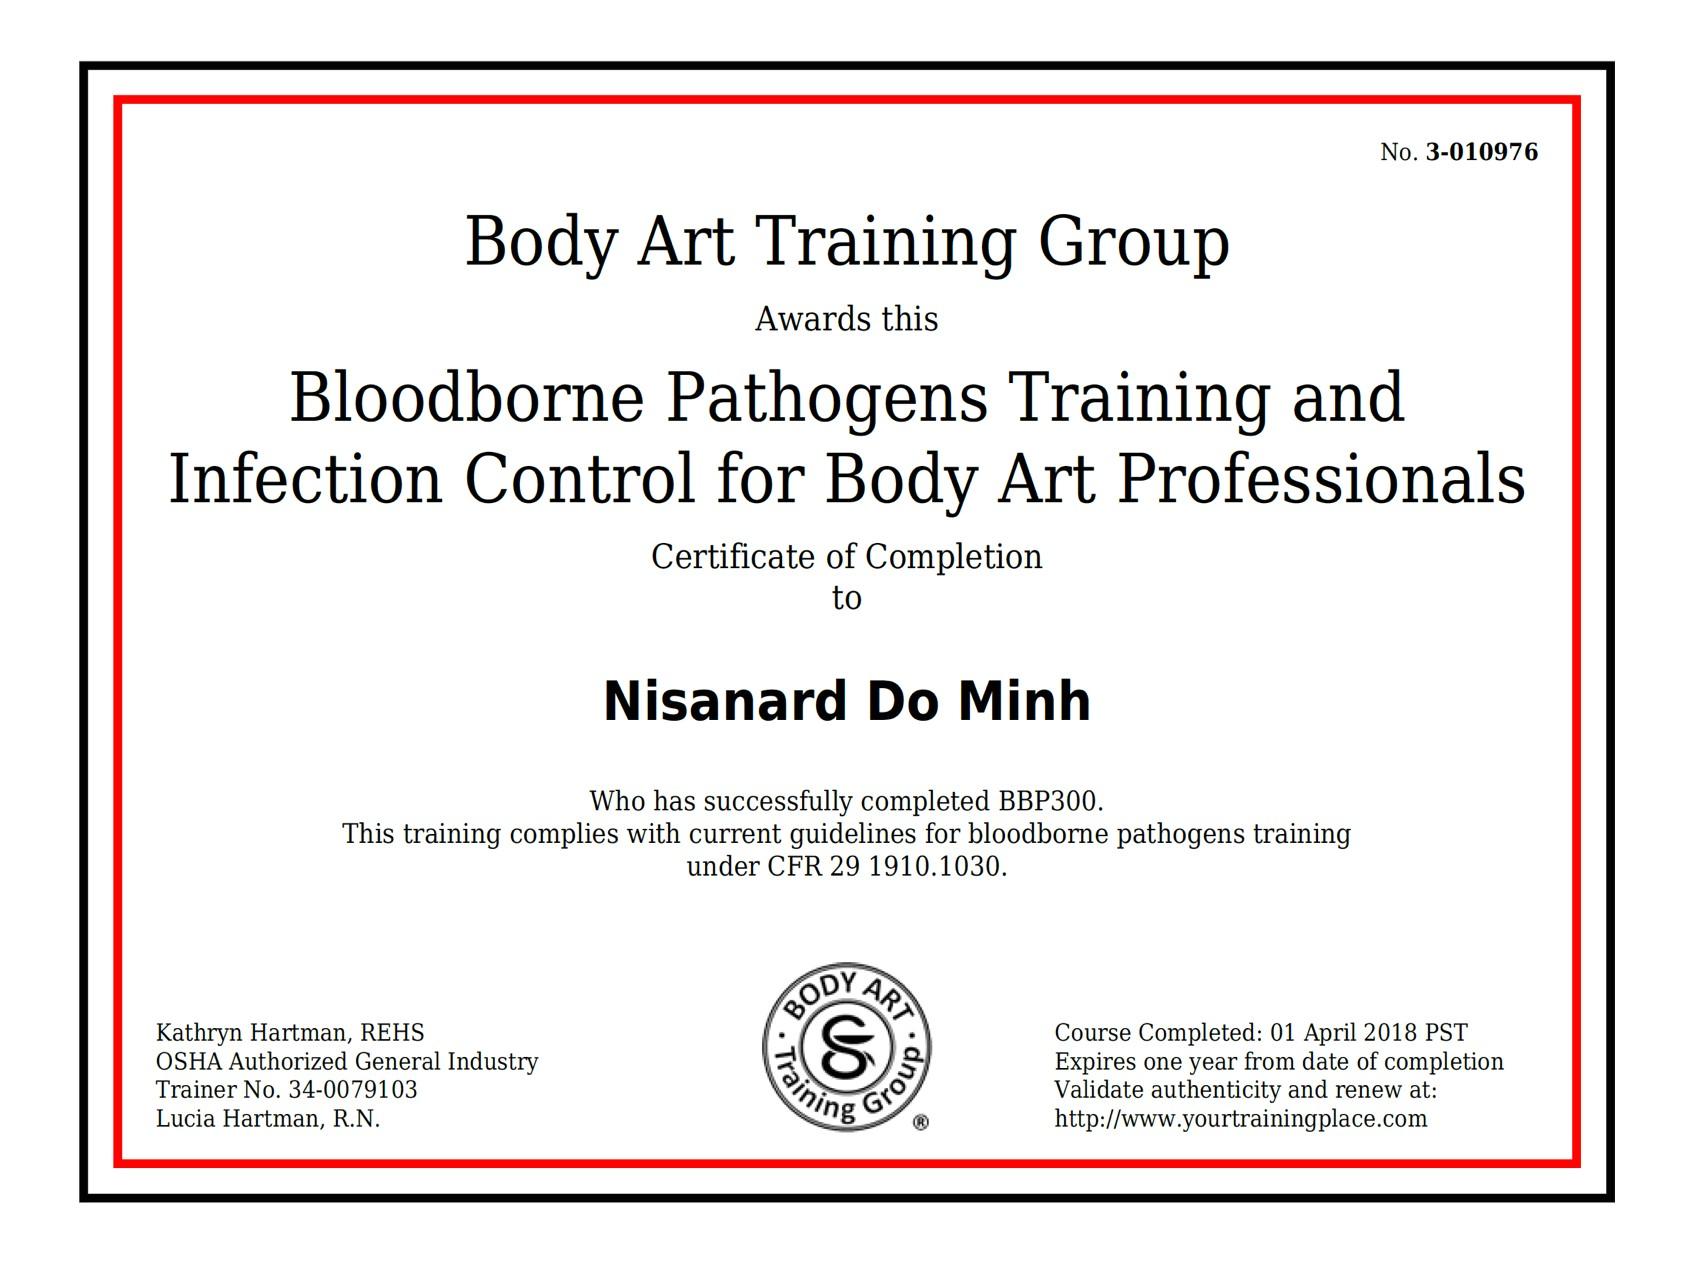 osha training certificate template